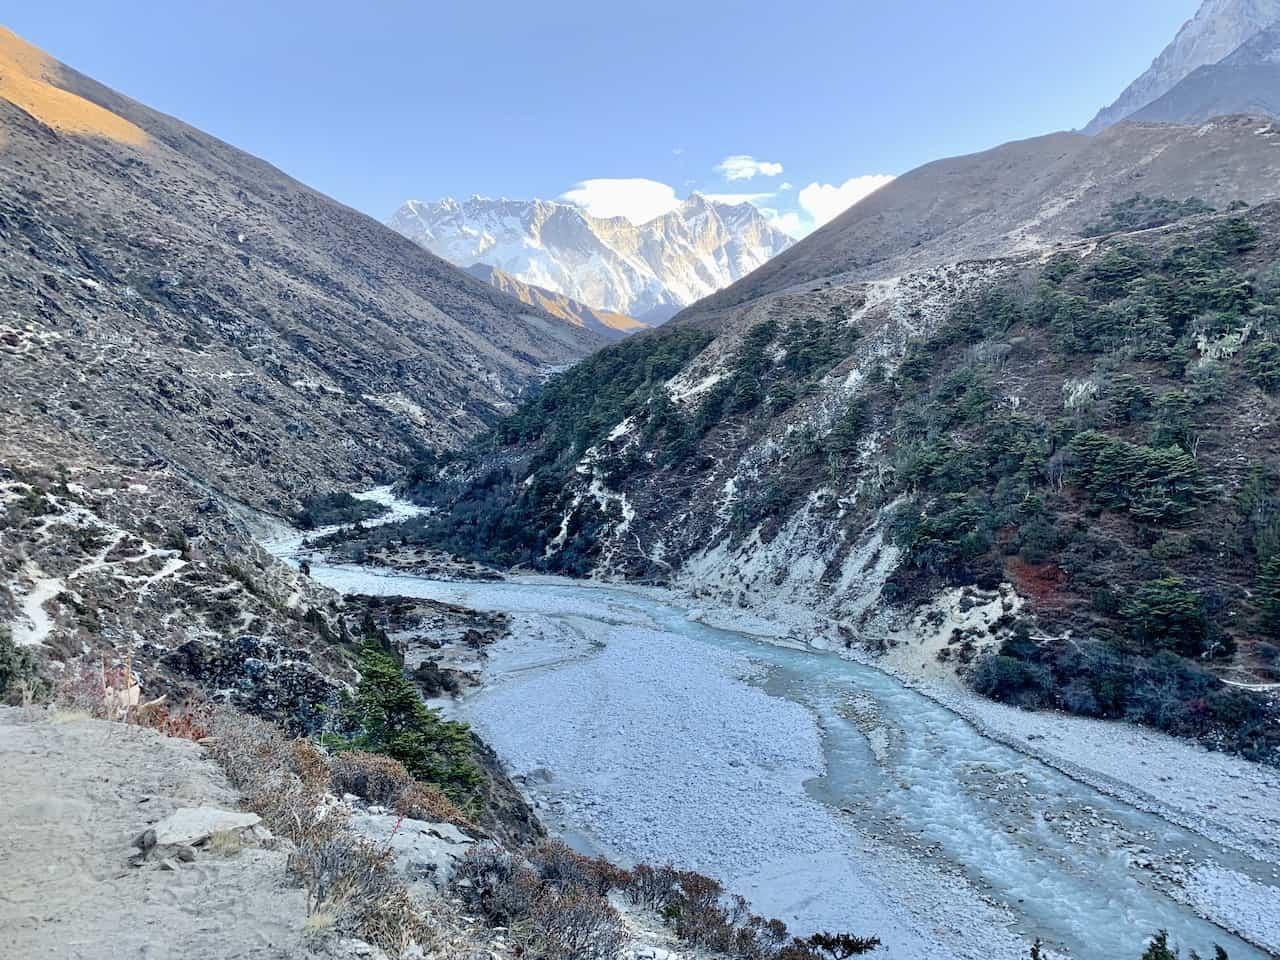 Dhudh Kosi River Pangboche Nepal